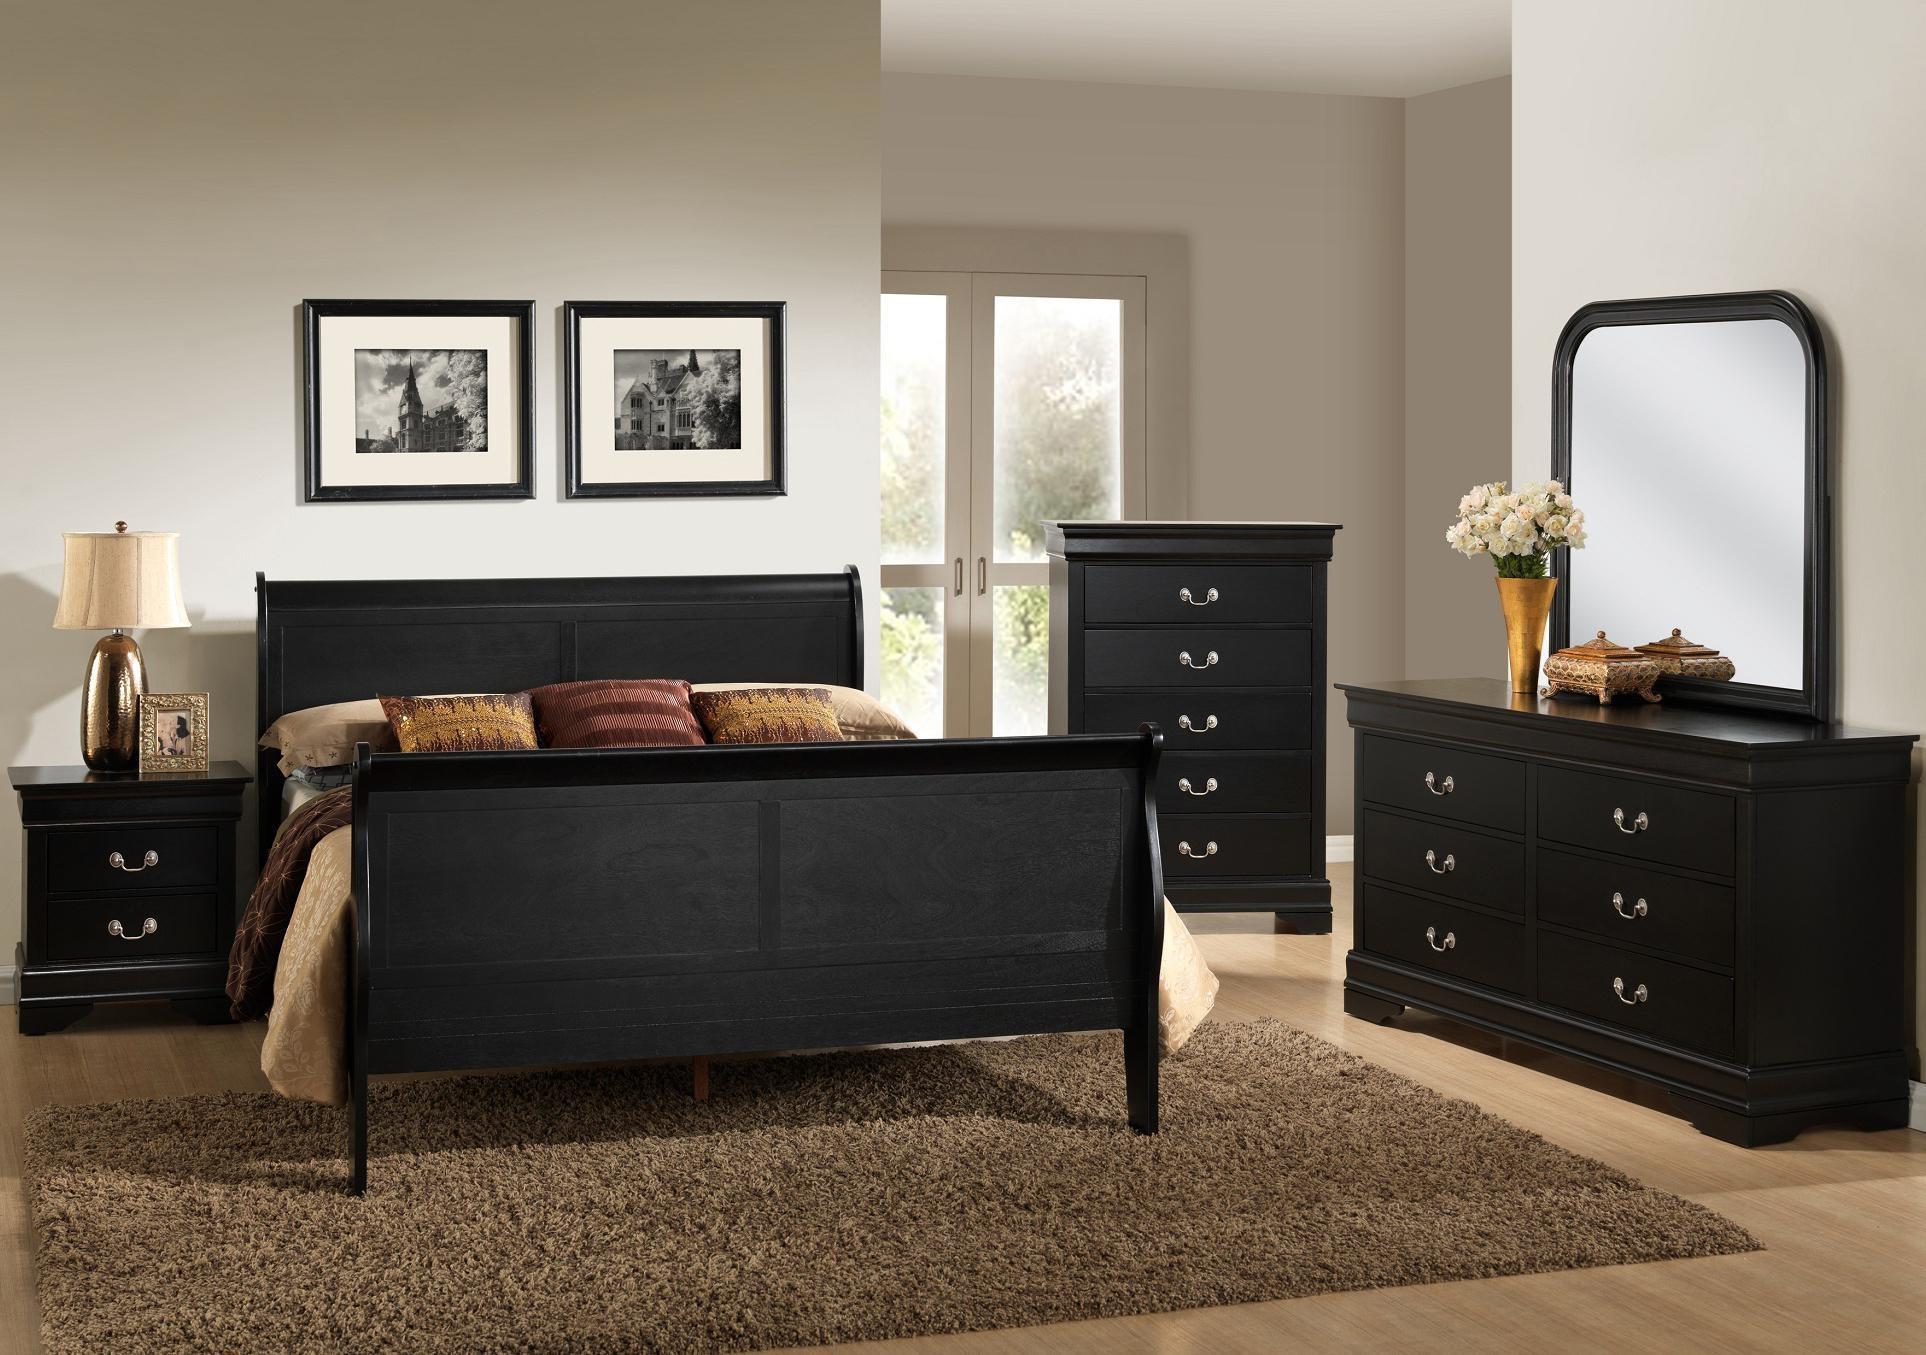 Lifestyle Louis Phillipe Queen 4-Piece Bedroom Group - Item Number: C5934 Power Package